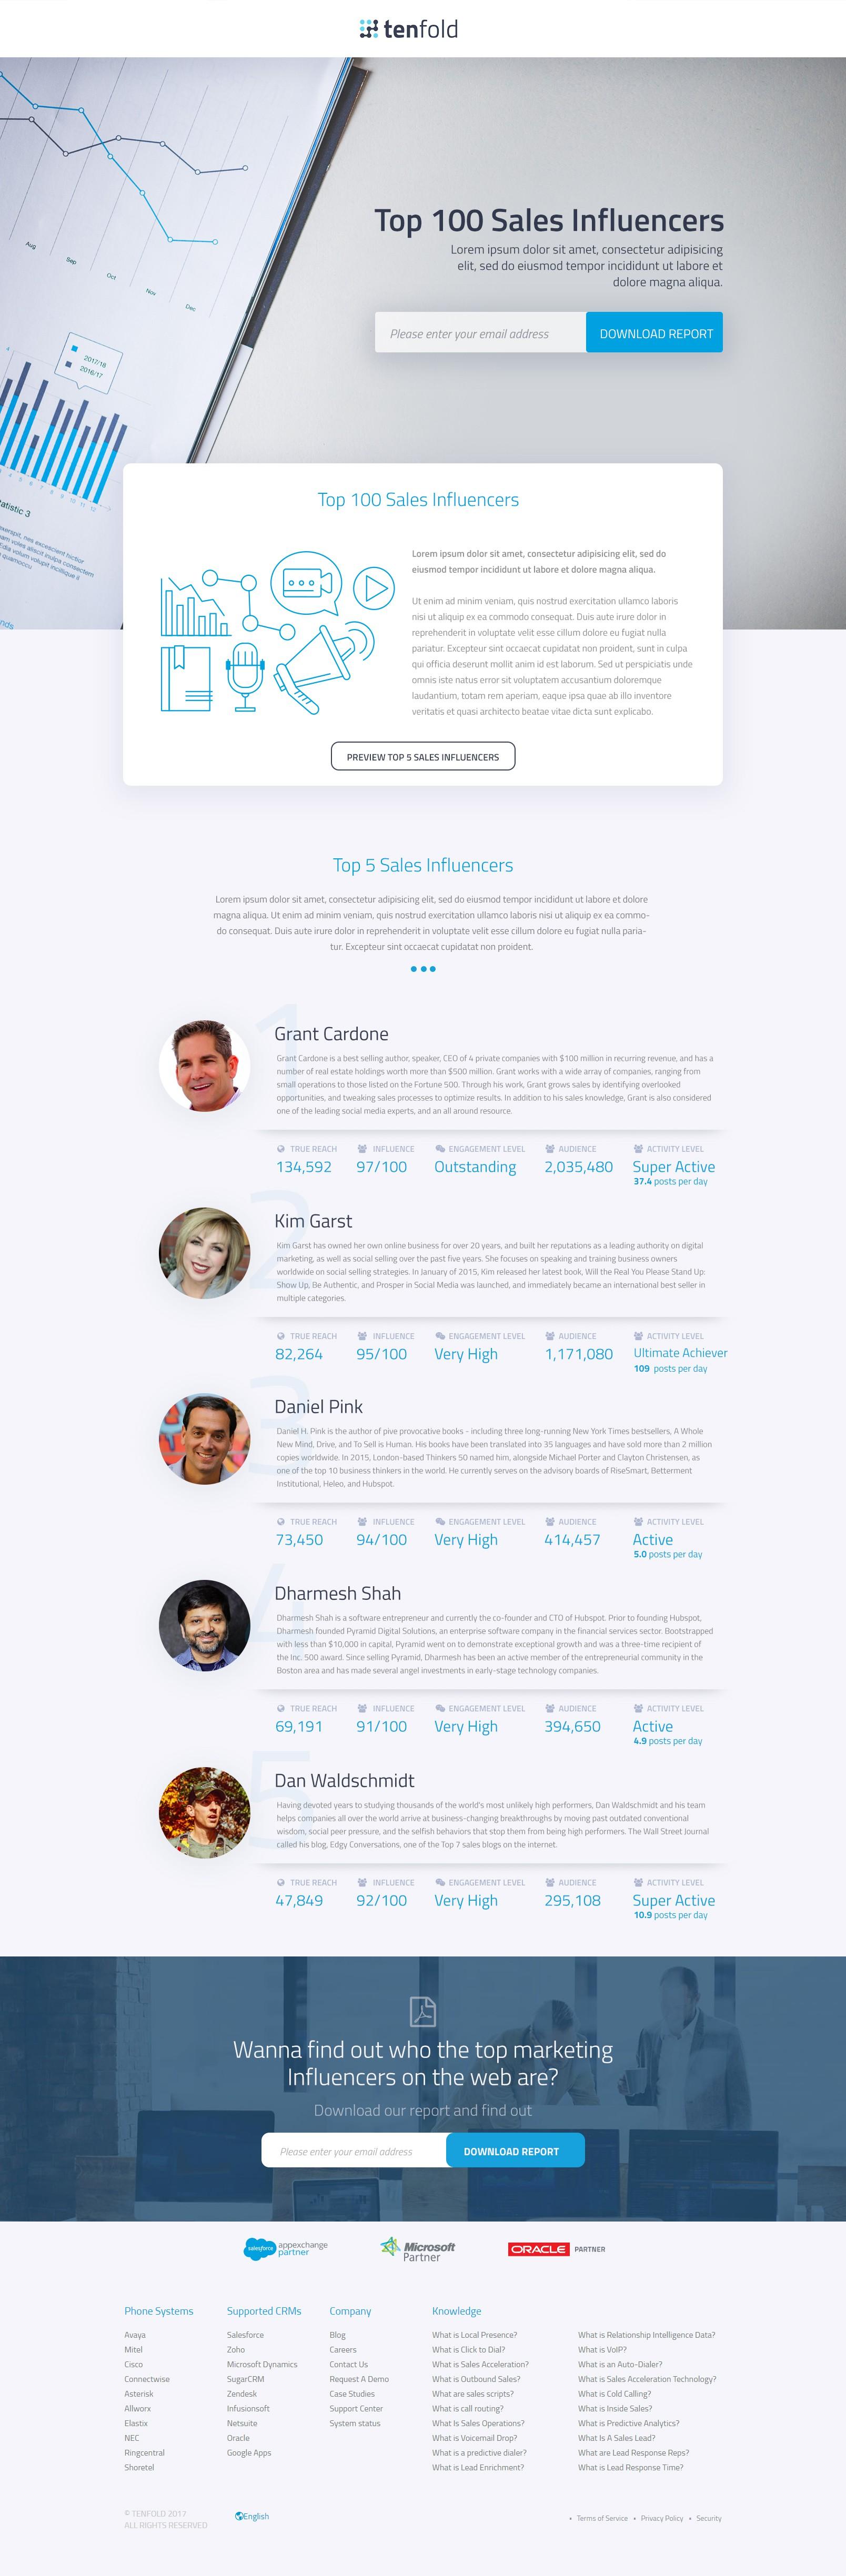 """Top 100 Sales Influencers"" landing page"